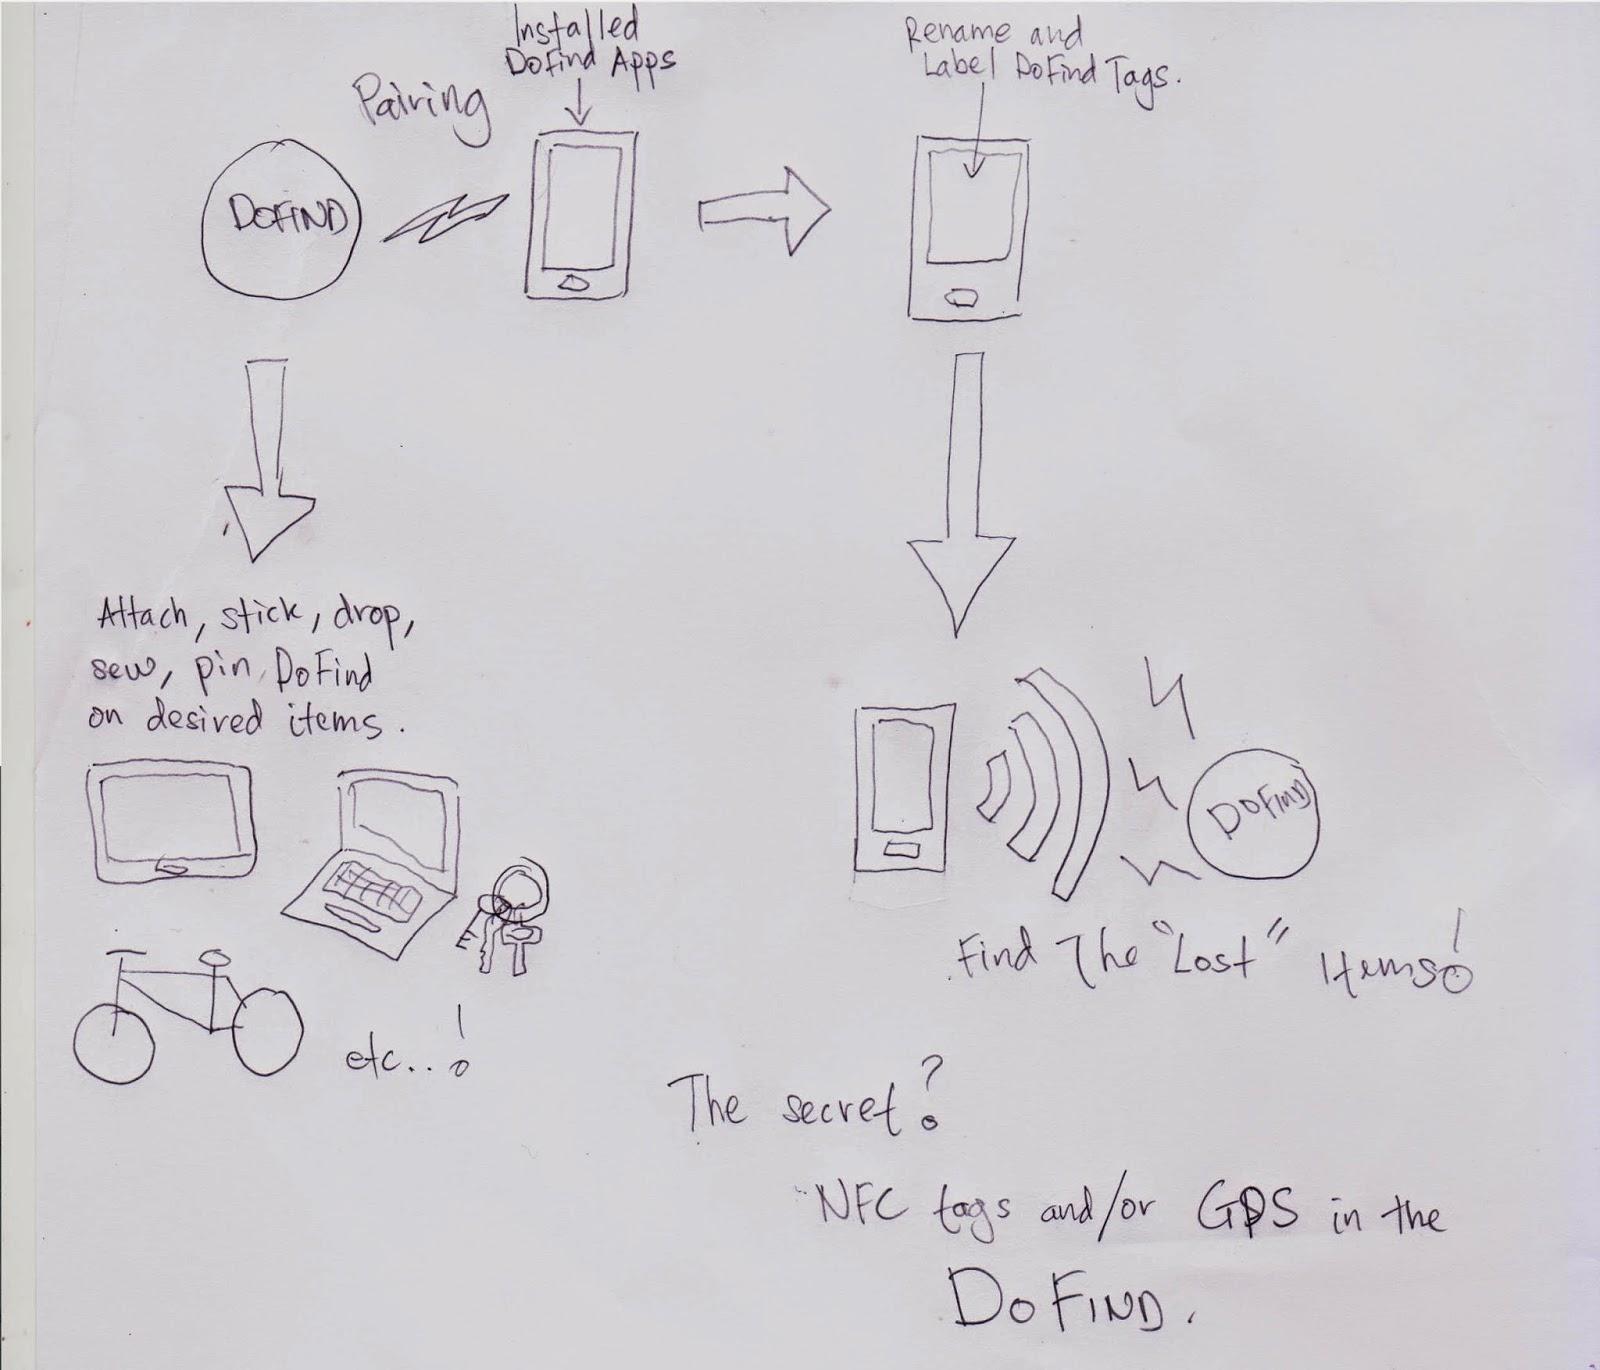 Business Idea Challenge Dolynx Sdn Bhd